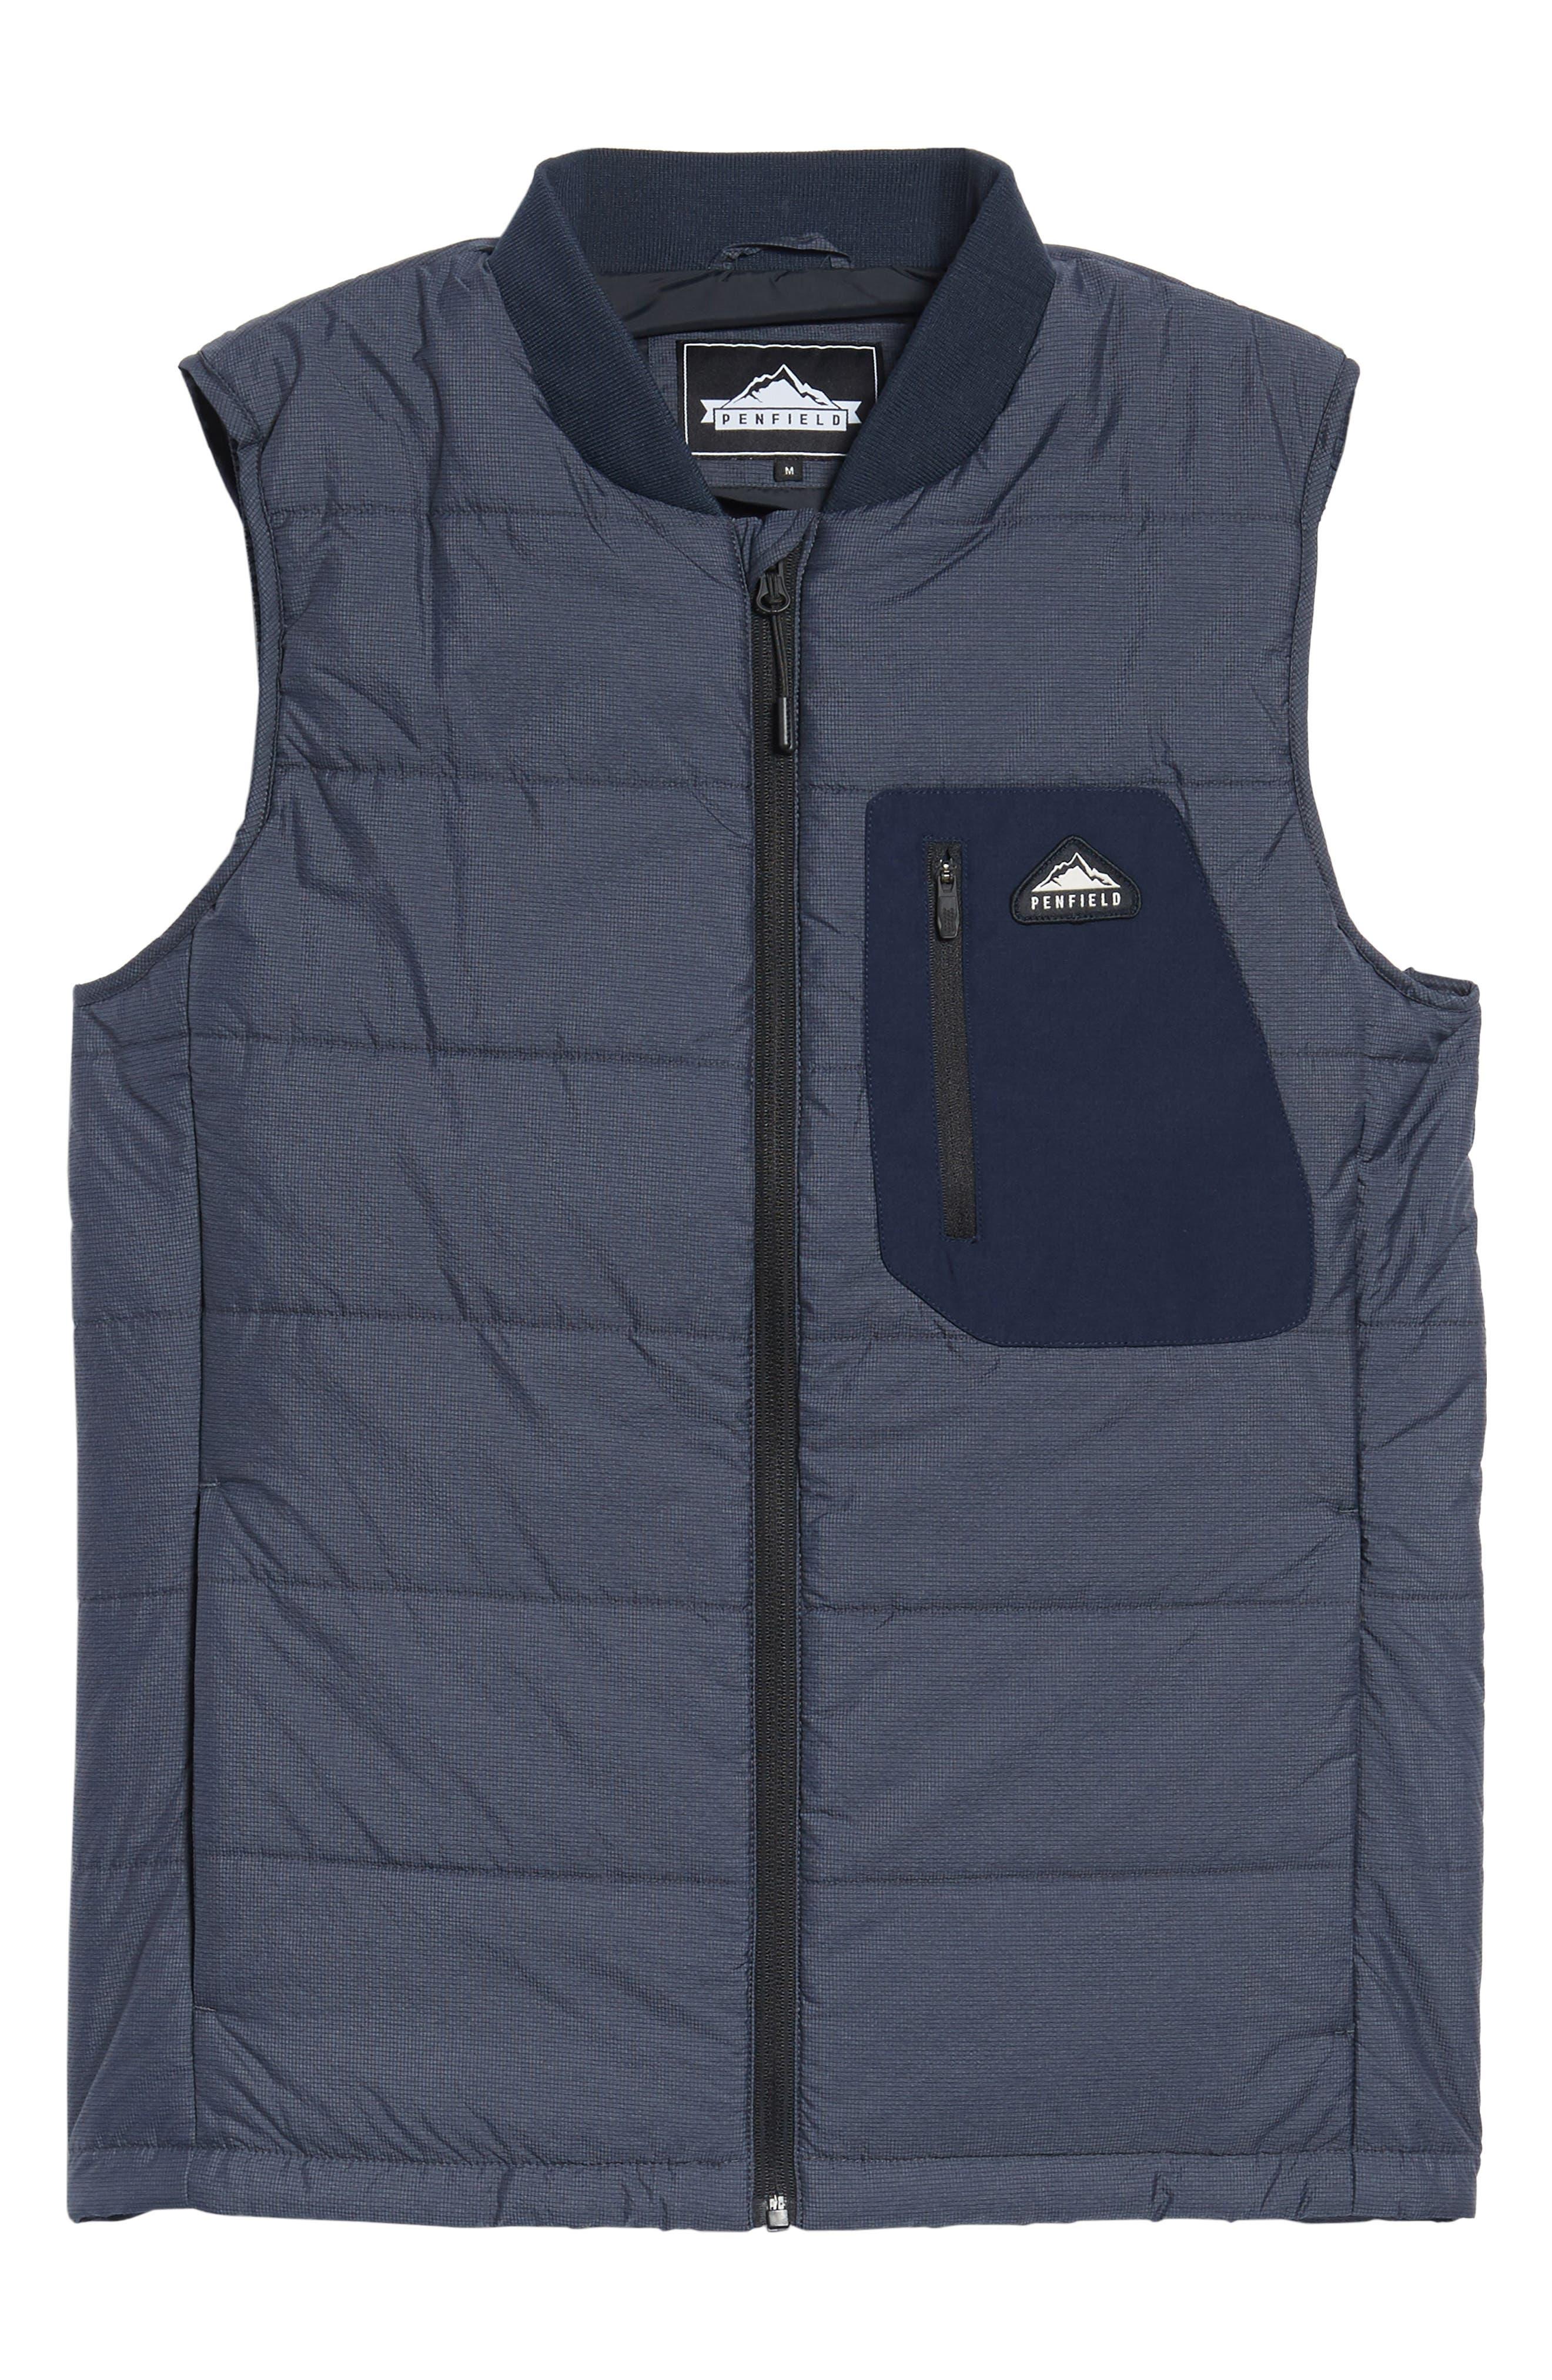 Foley Vest,                             Alternate thumbnail 6, color,                             Navy